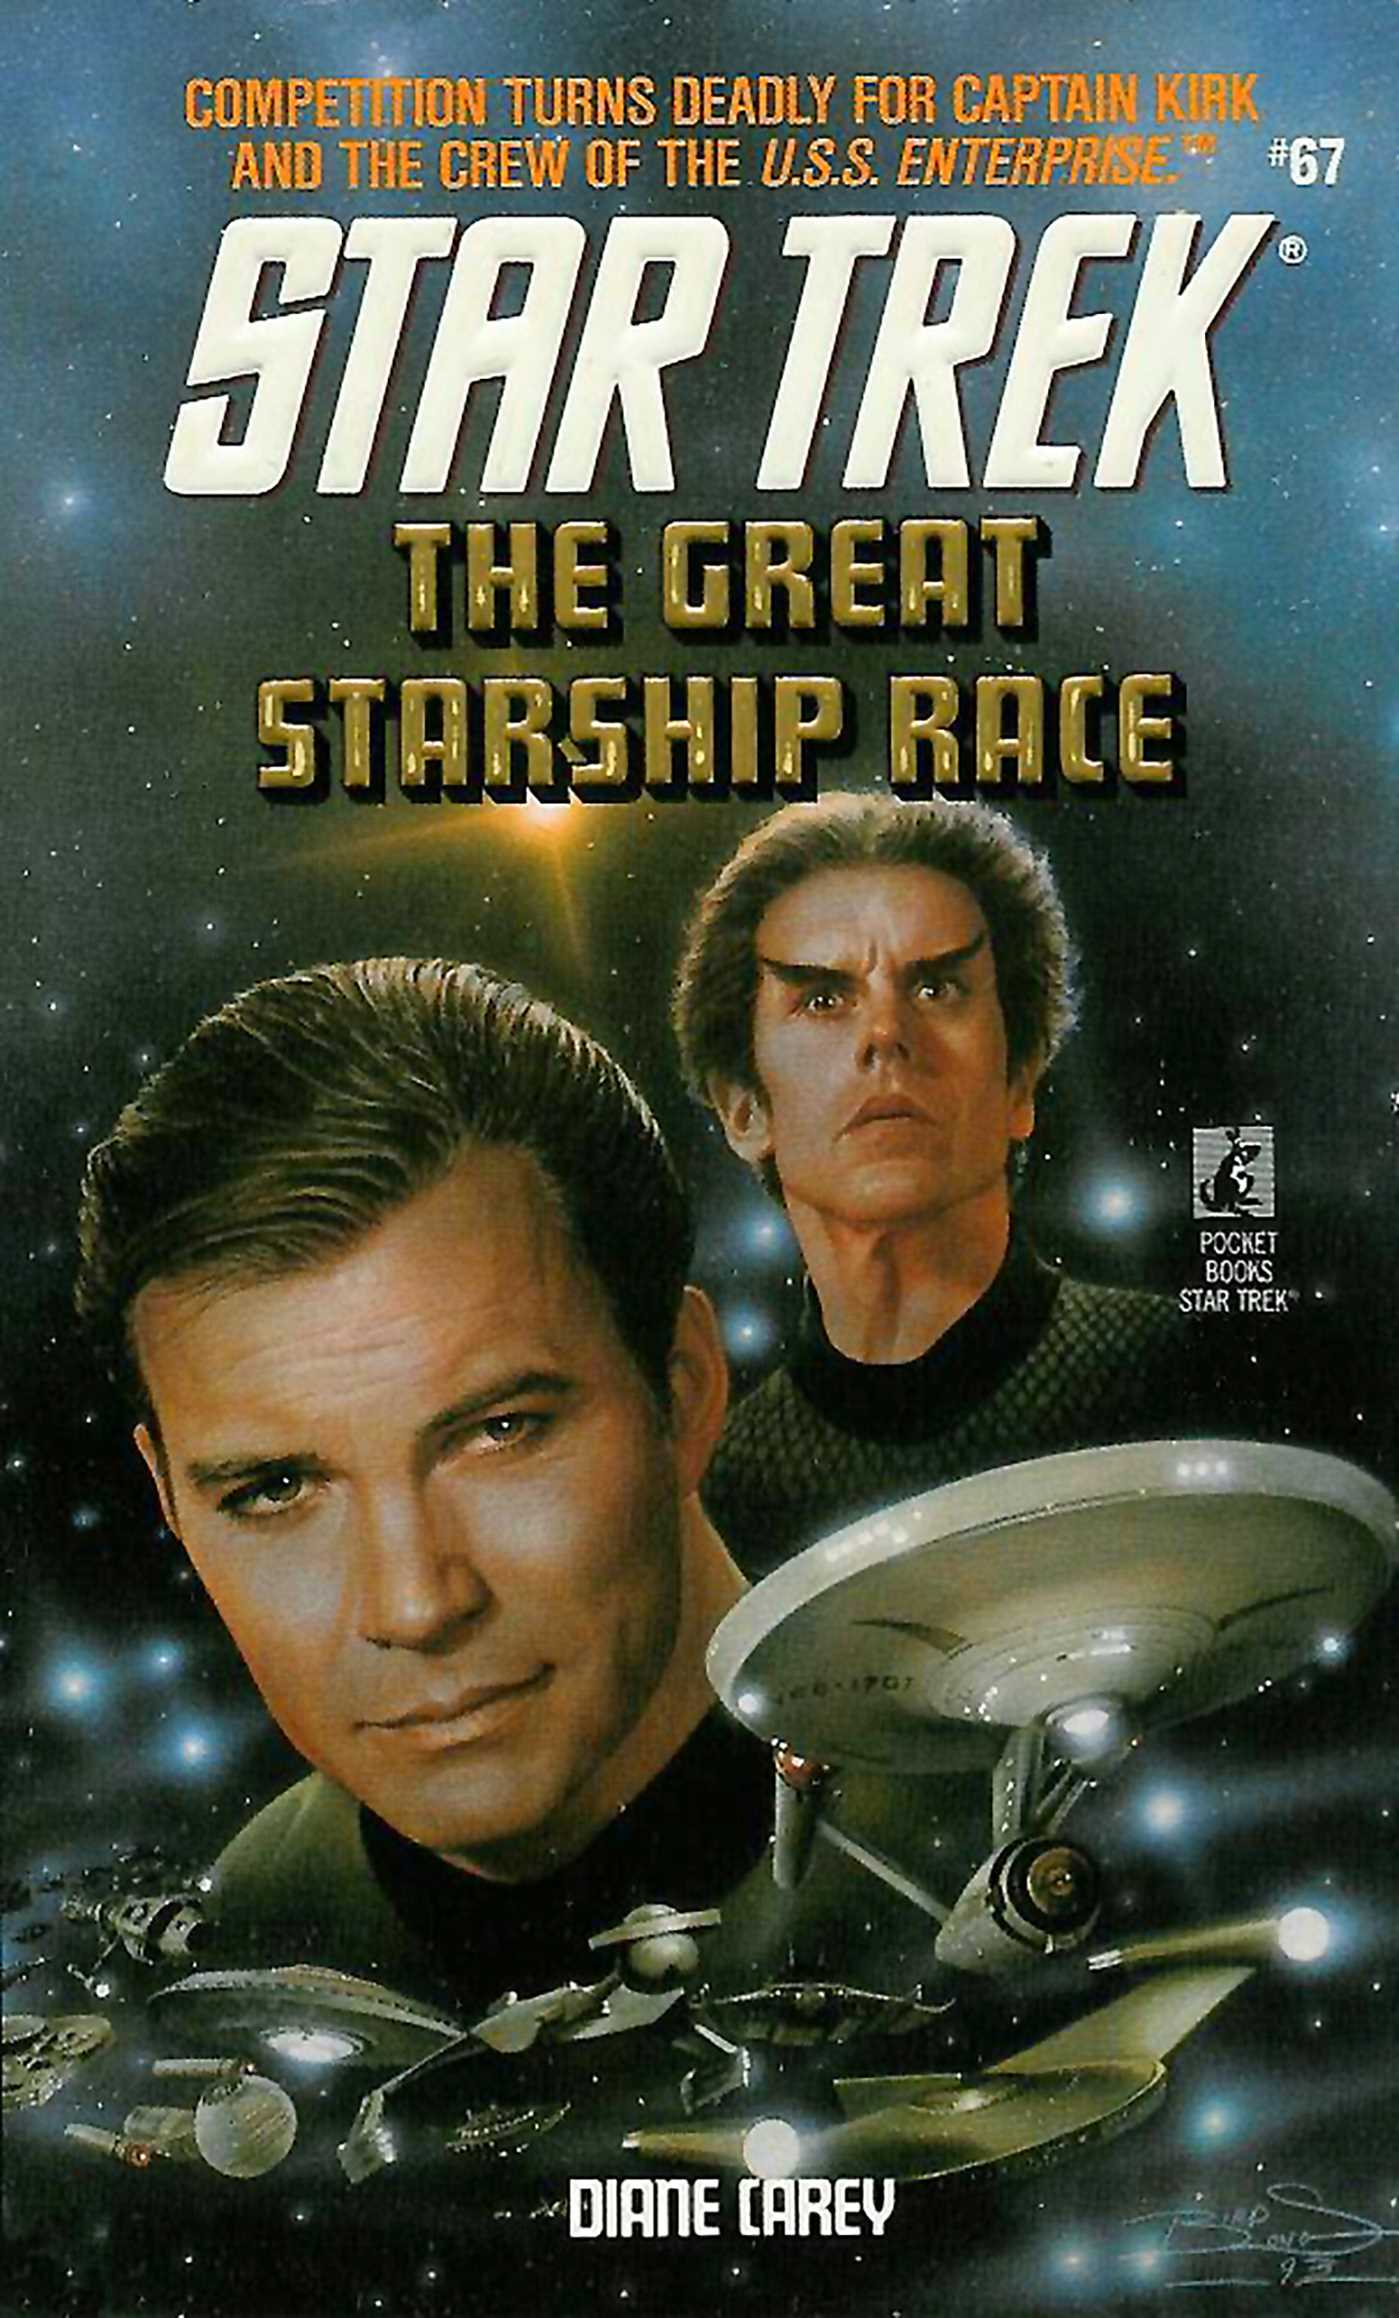 The great starship race 9780743420181 hr